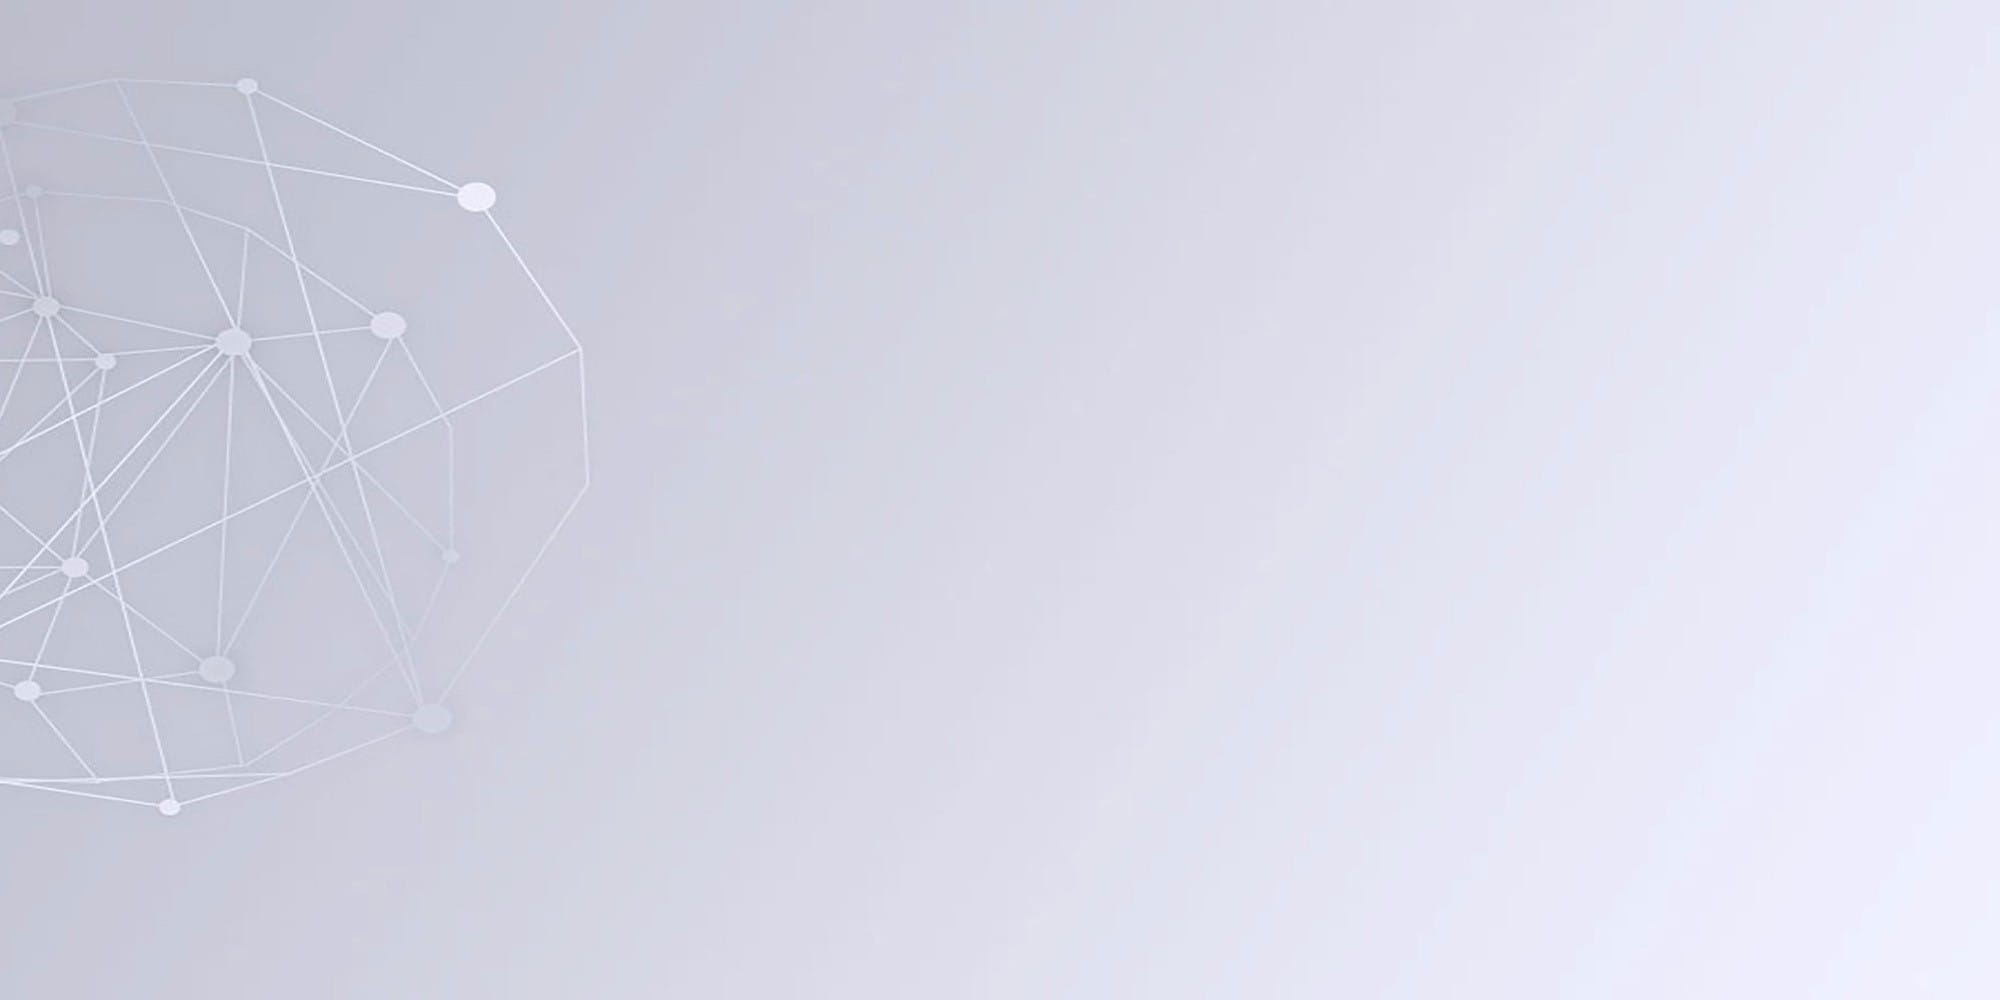 network framework on gray background